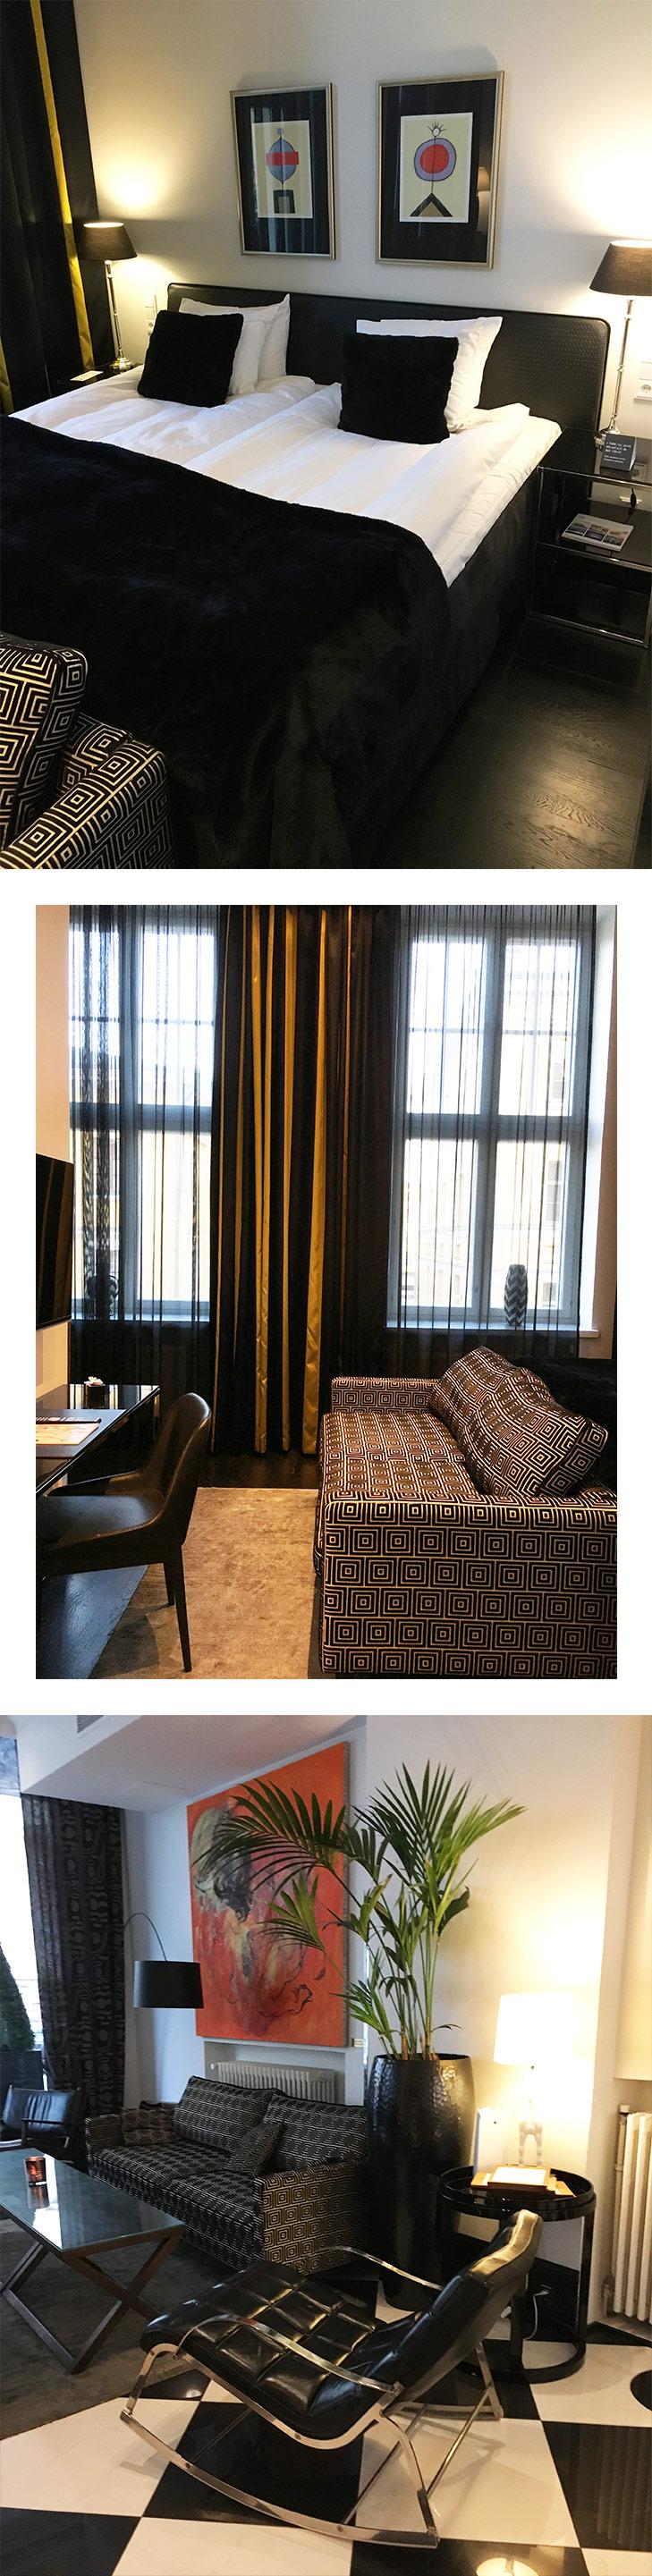 Lilla-Roberts--Hotel_Visit-Finland_Breakfast-Goals-at-Lilla-Roberts_Hello-Miss-May.jpg